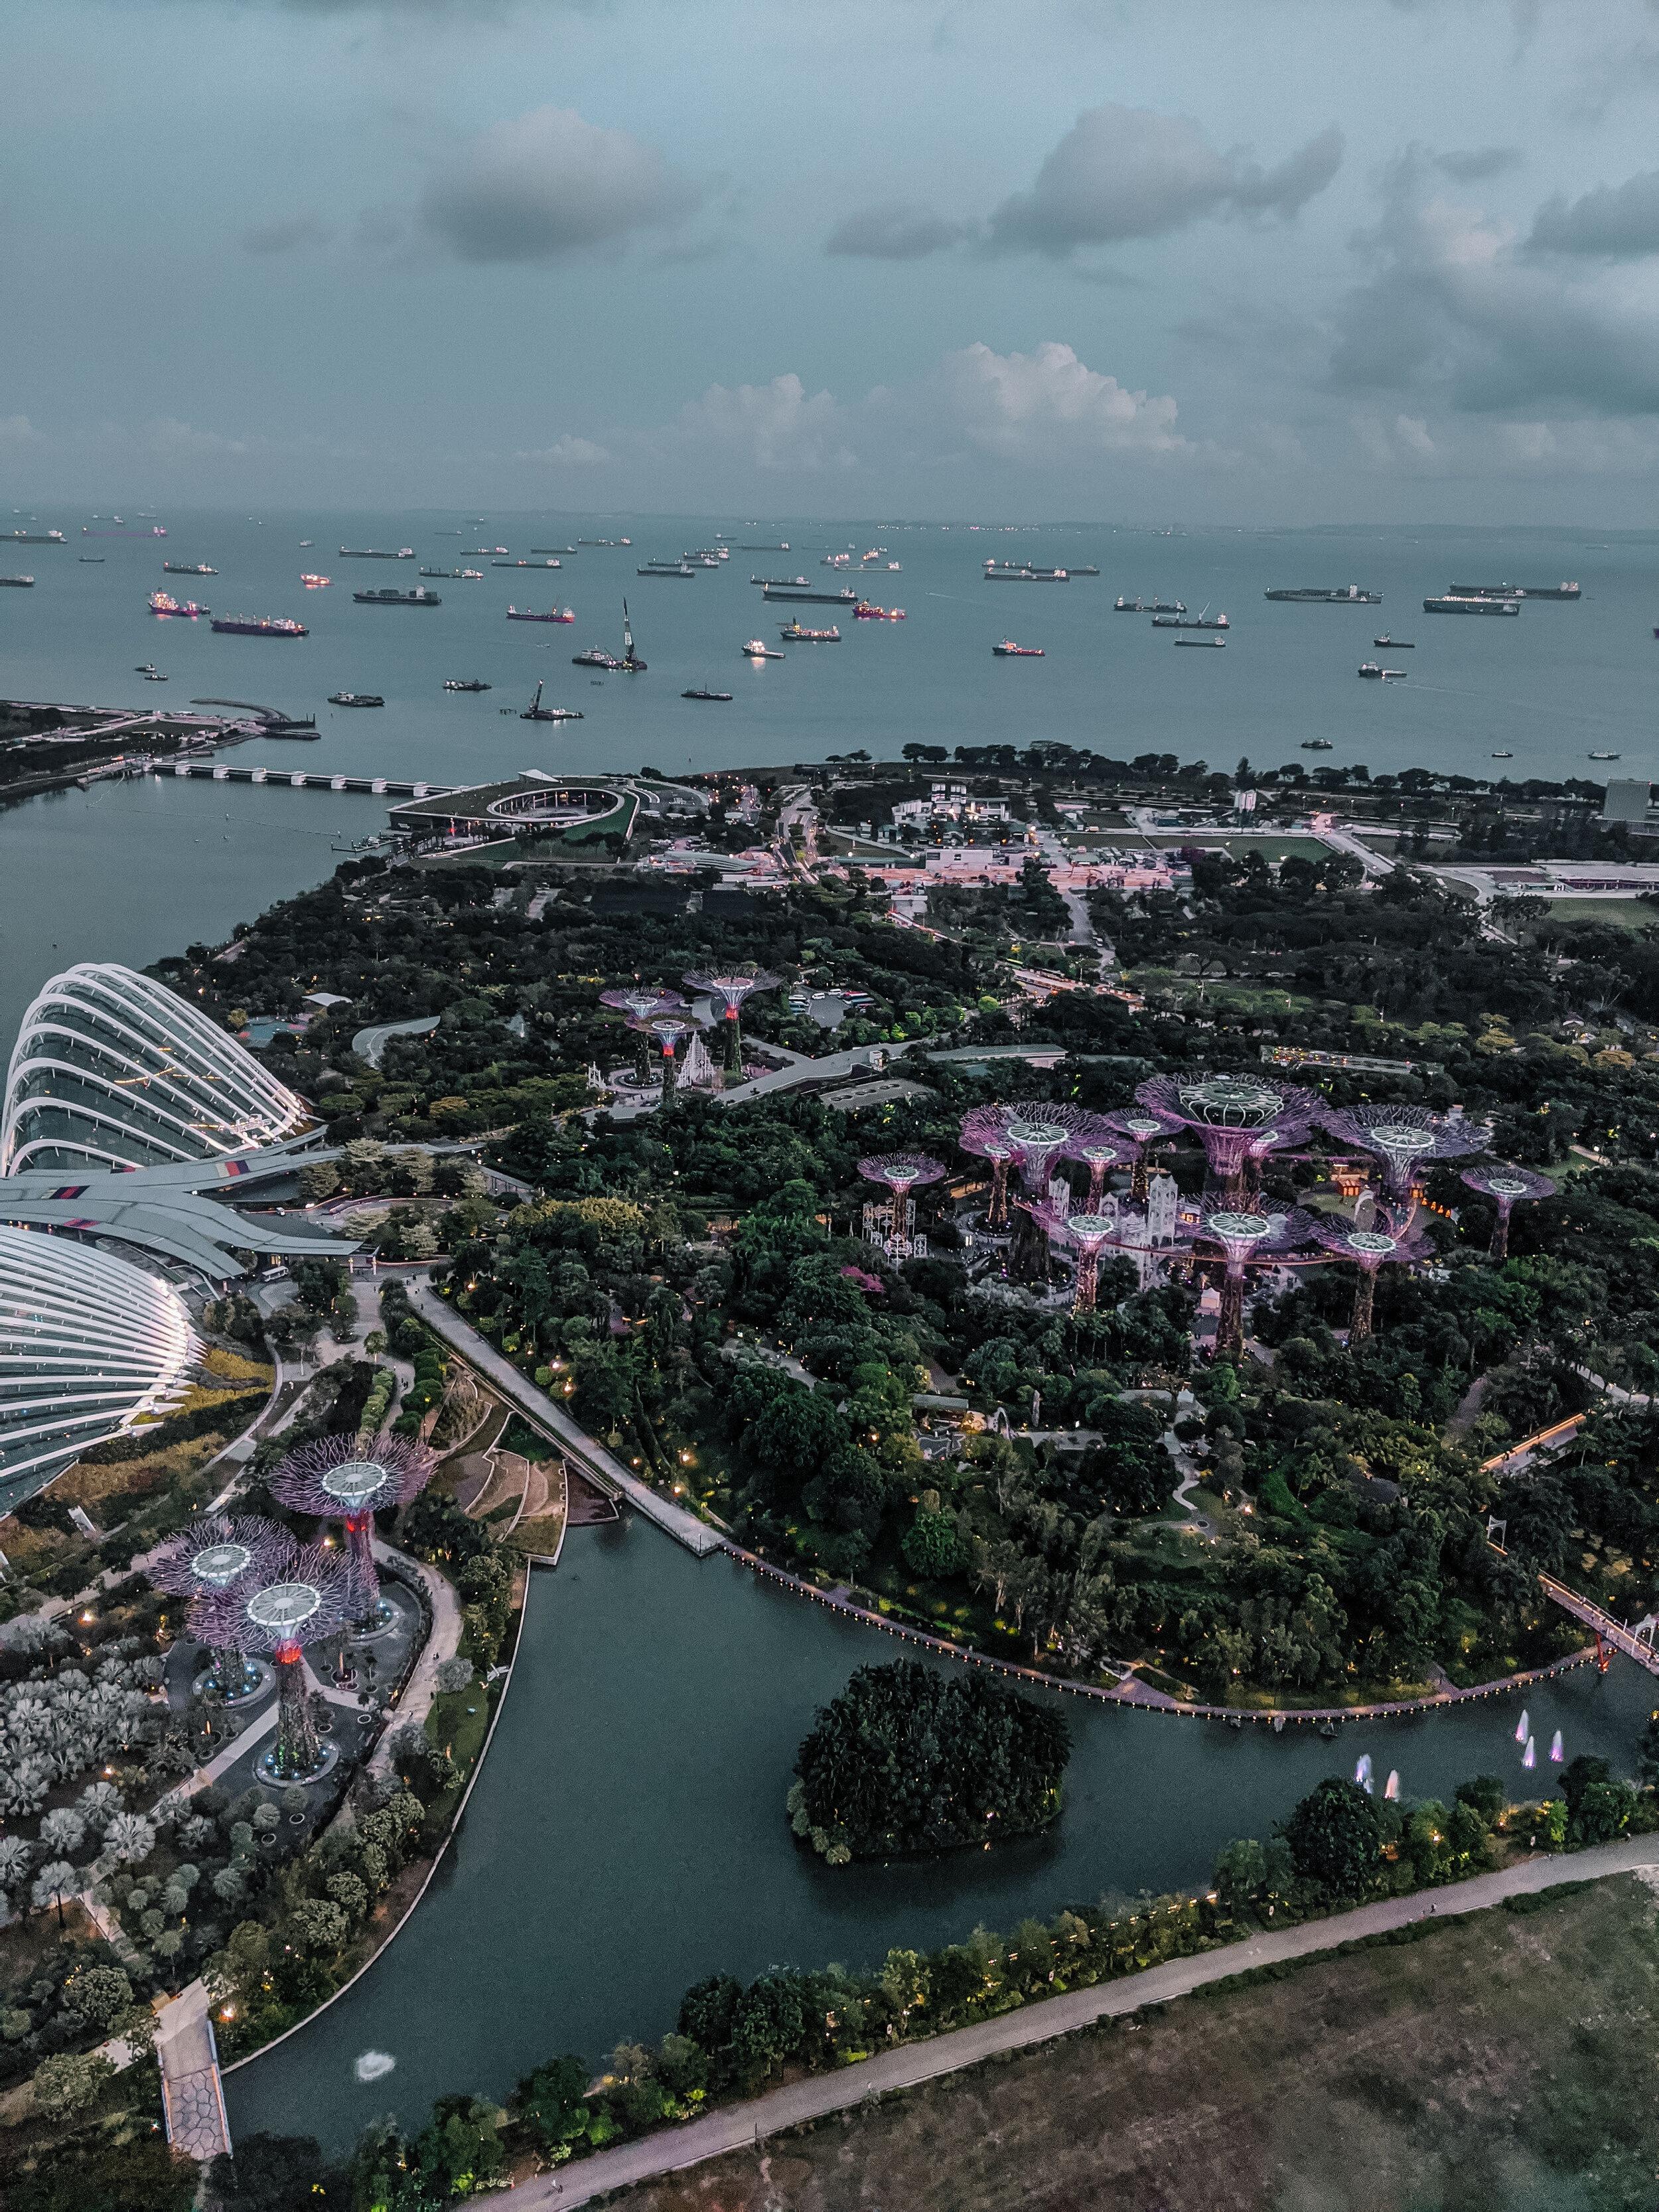 Rachel Off Duty: View from Marina Bay Sands SkyPark